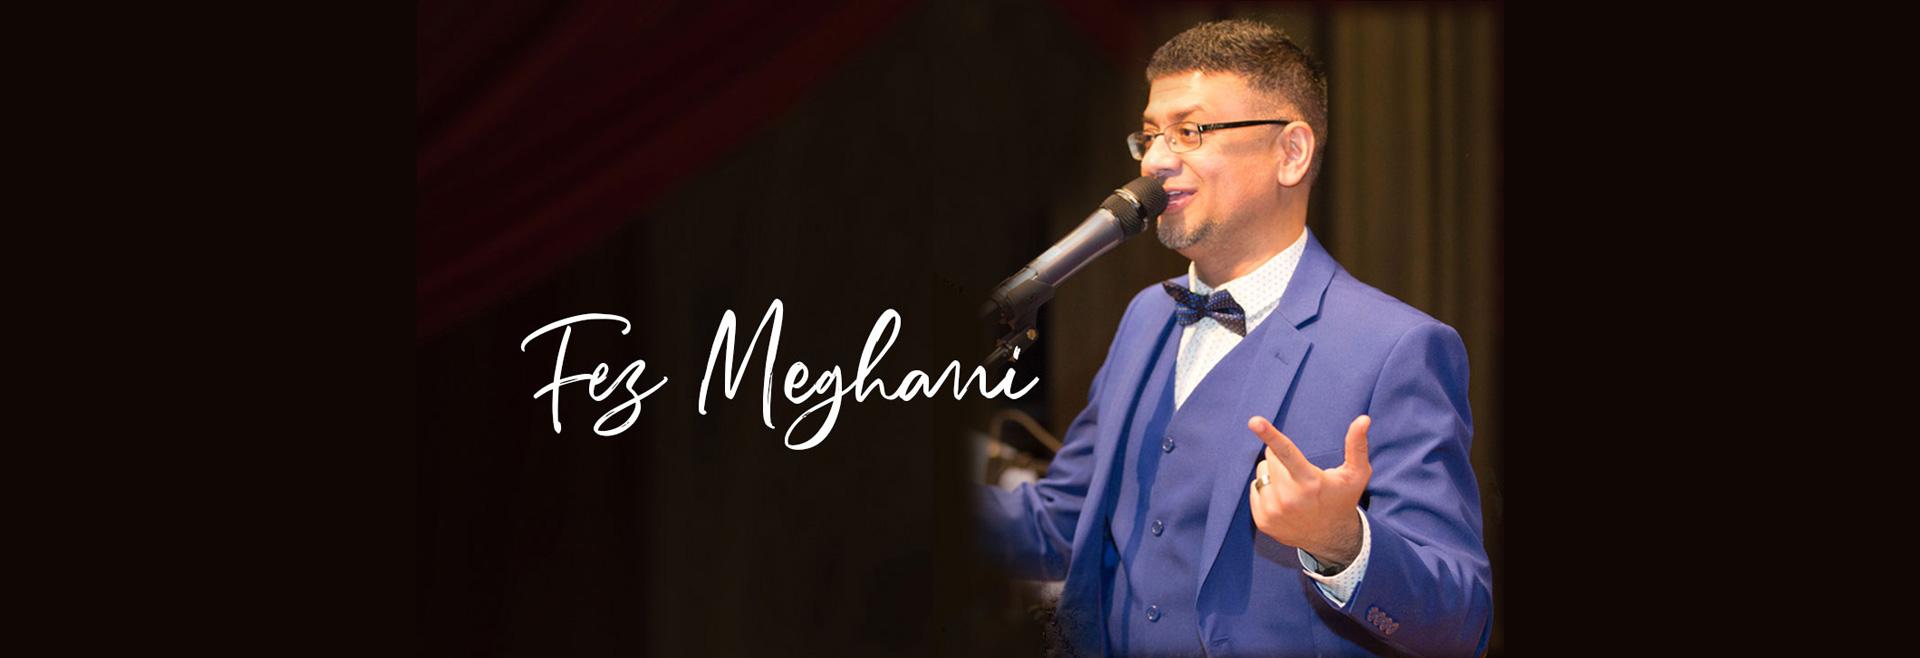 Fez Meghani